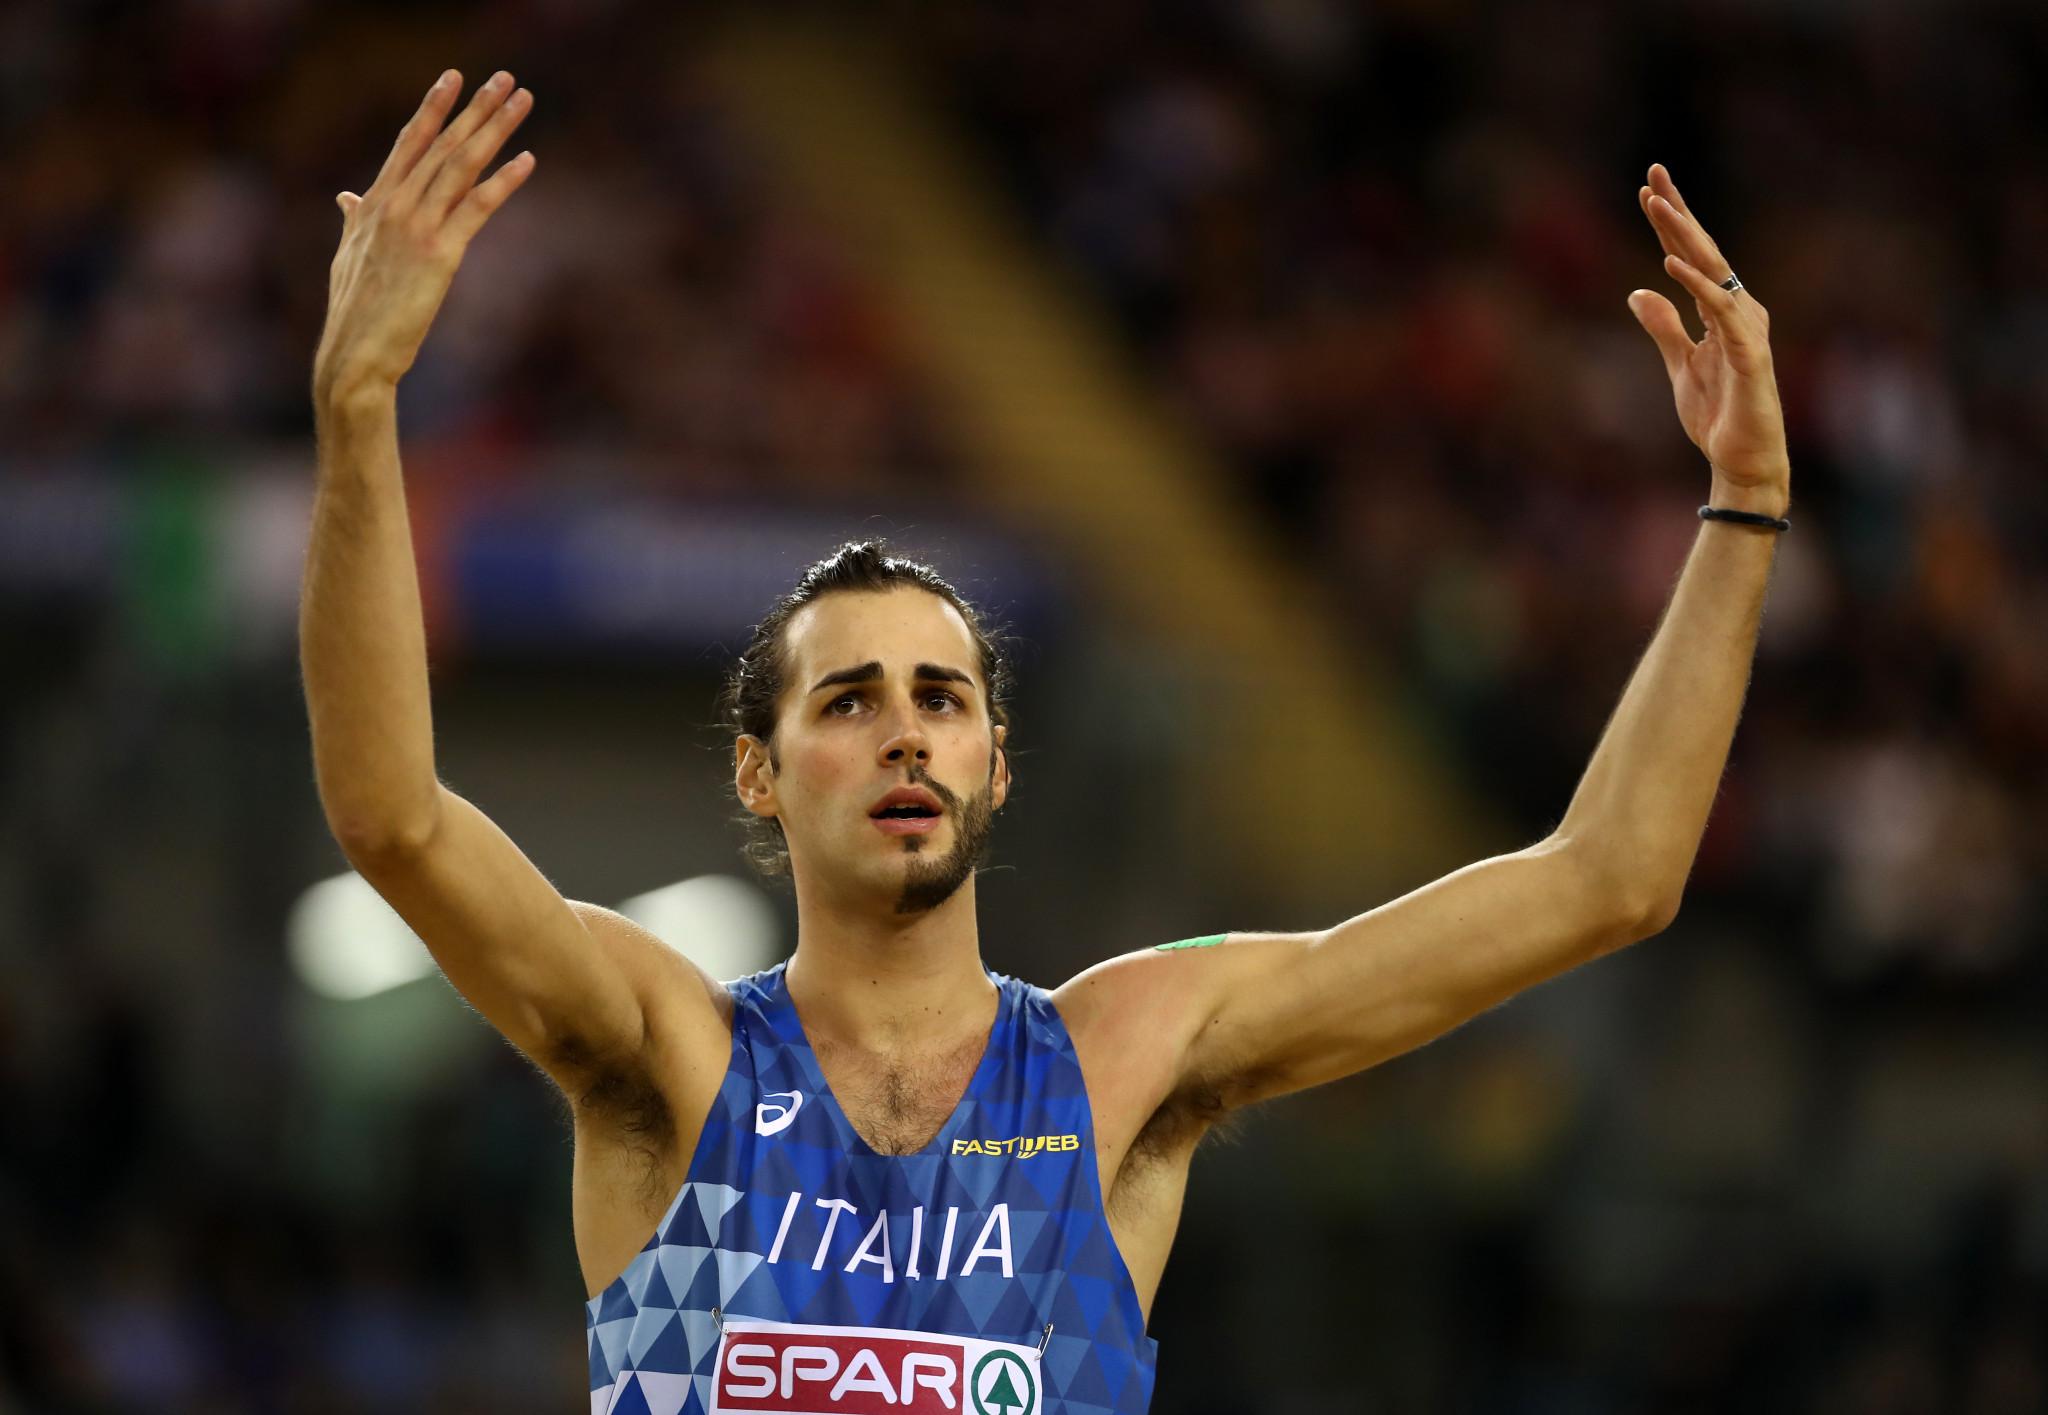 Former world indoor champion Tamberi takes Banskobystrická latka men's high jump title